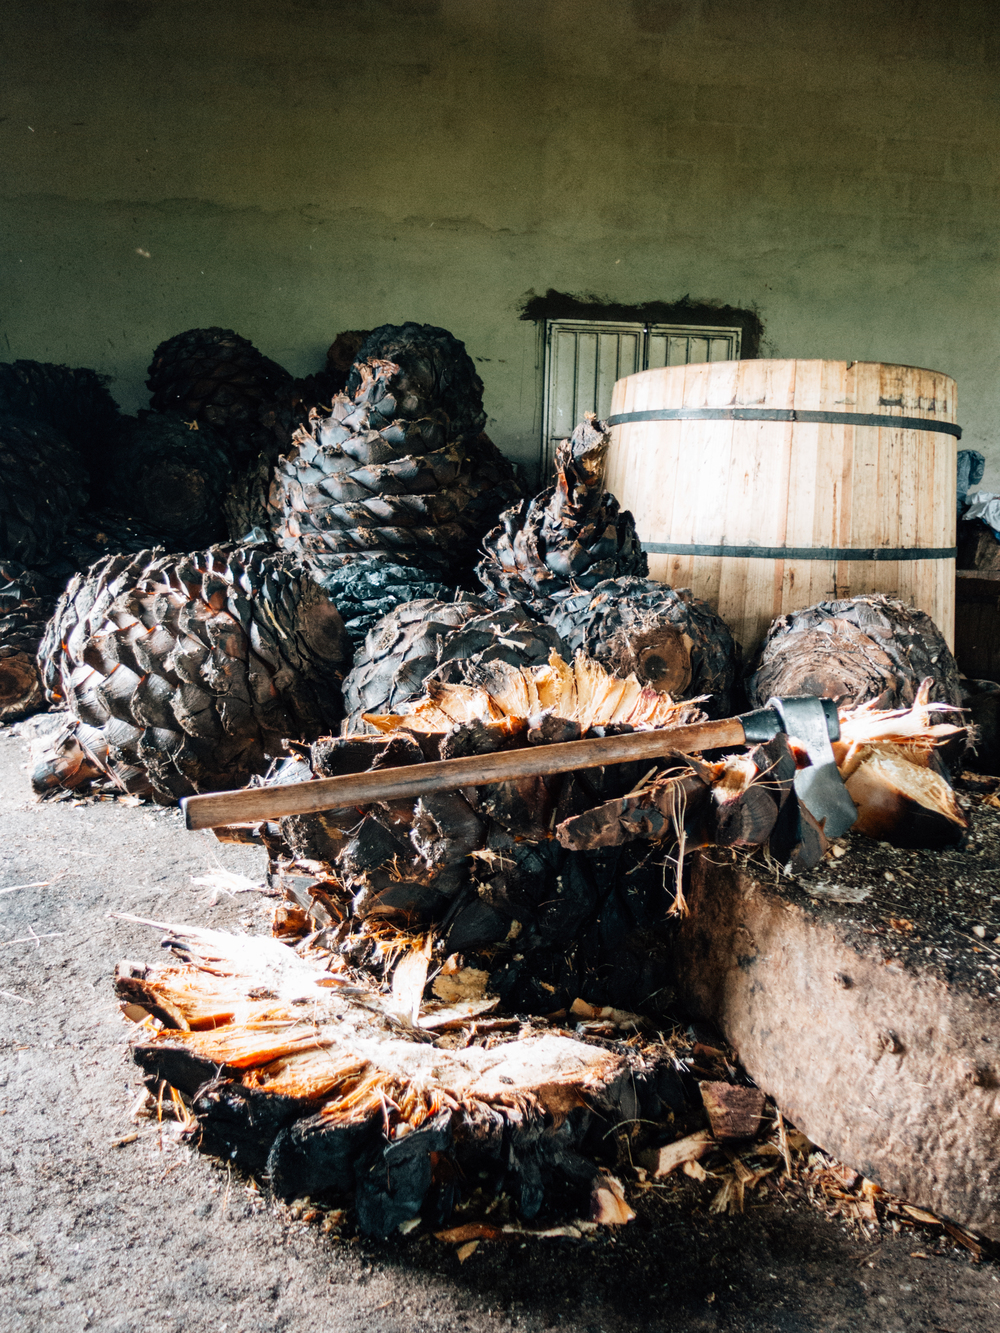 Cooked piñas